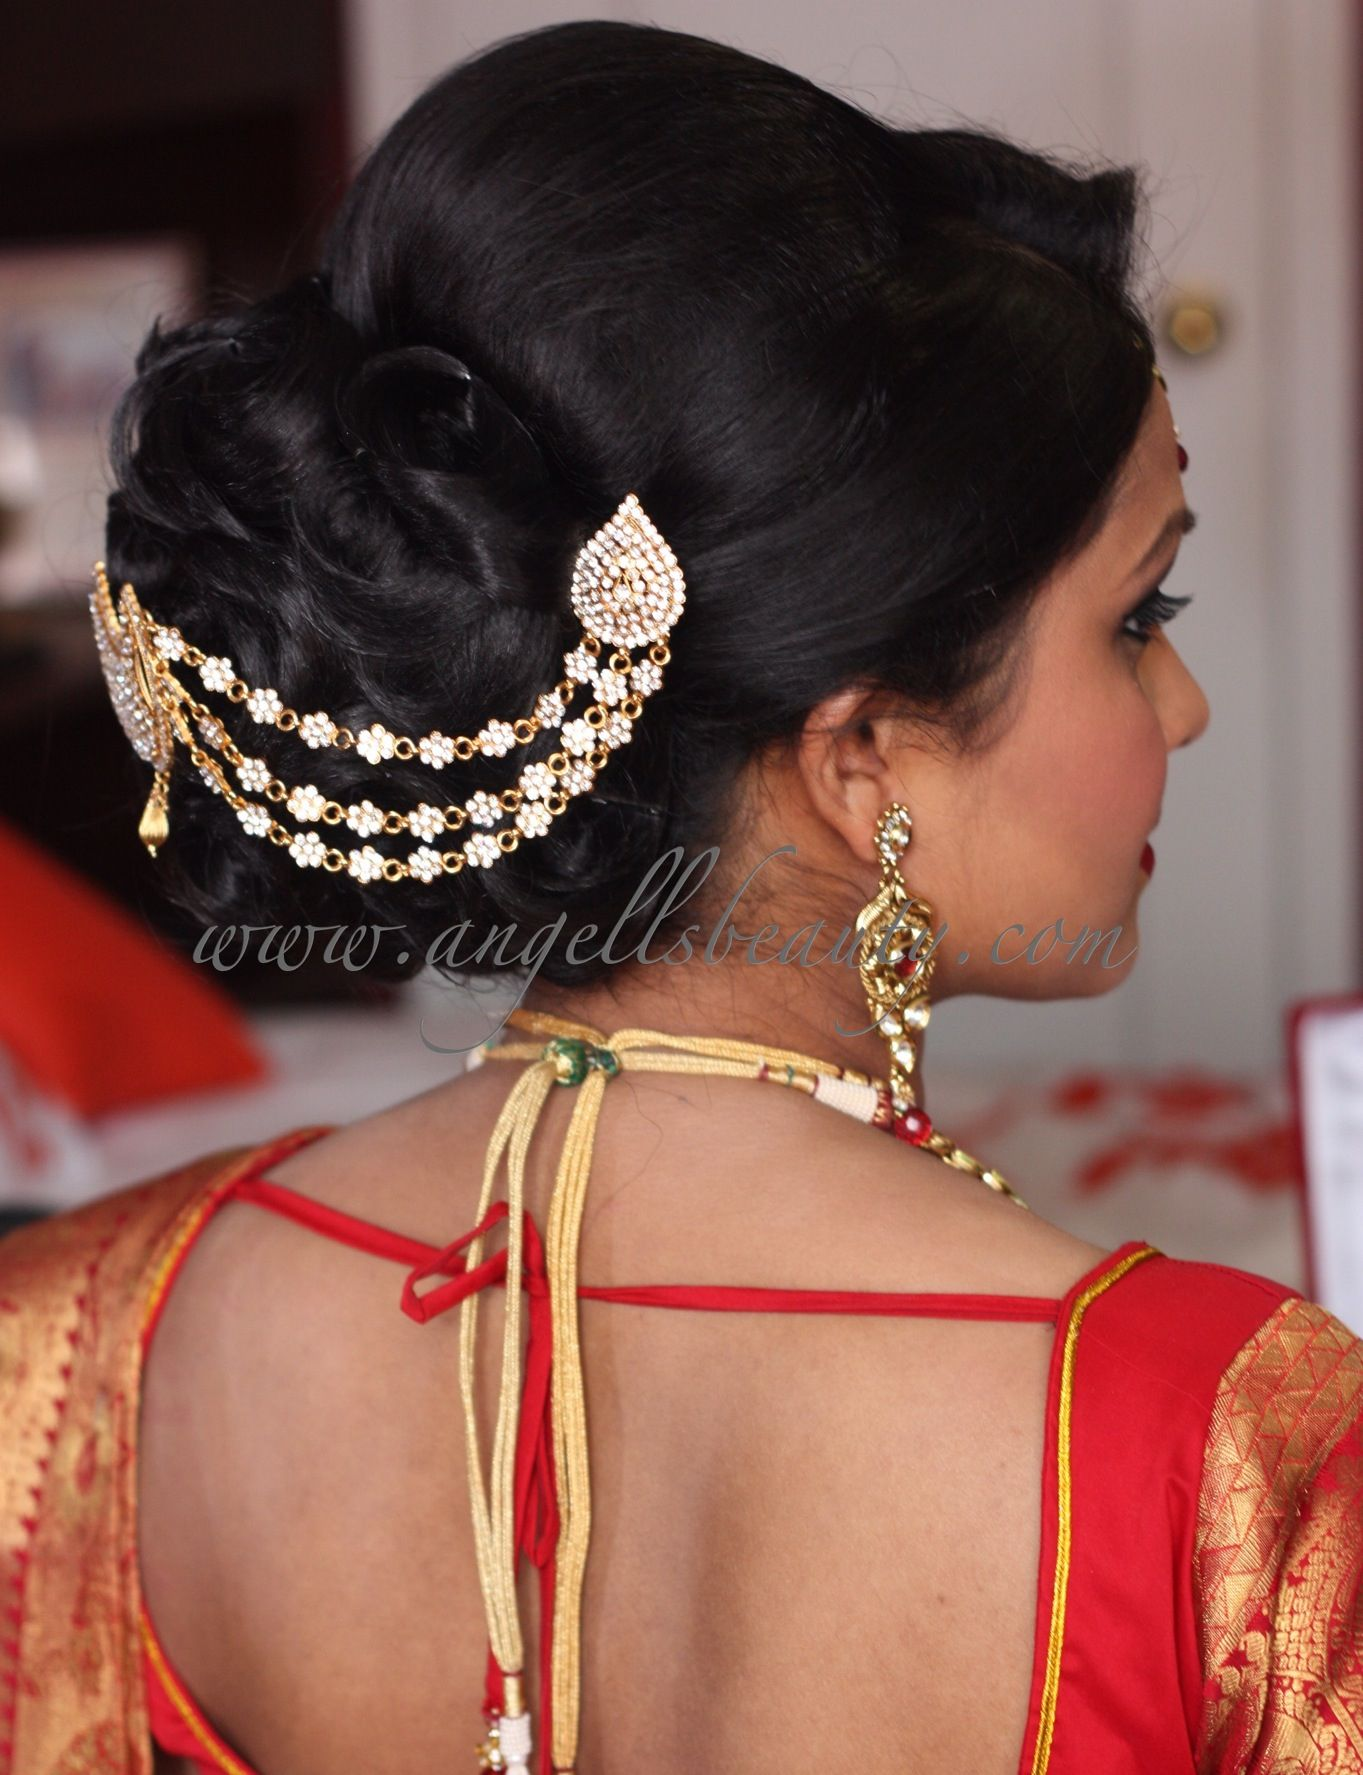 Fresh jasmine being pinned into brides hair at a hindu wedding in